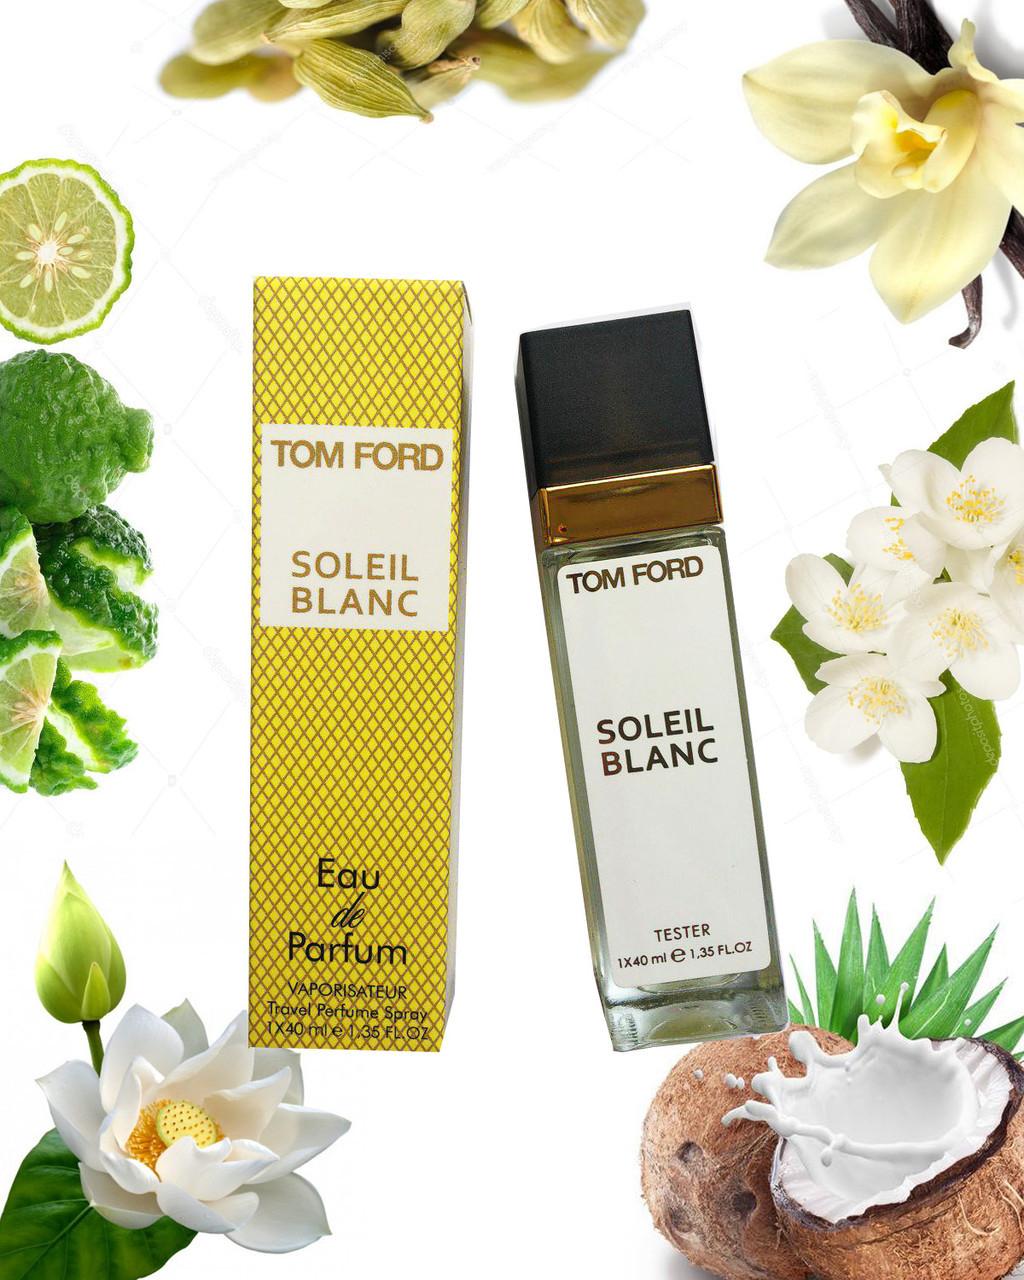 Tom Ford Soleil Blanc eau de parfum тестер 40 мл